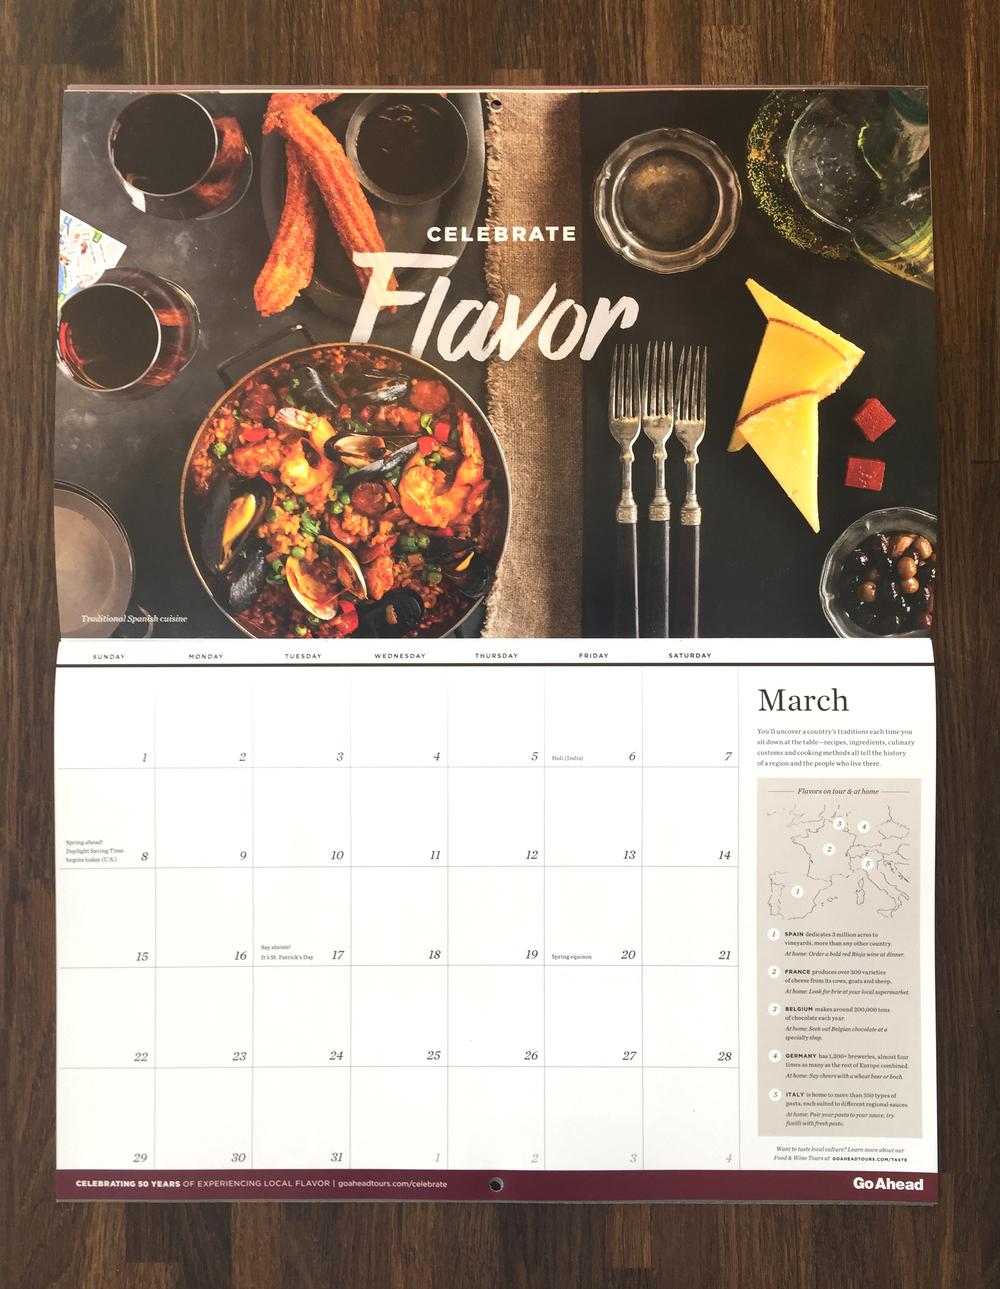 Calendar_March.jpg